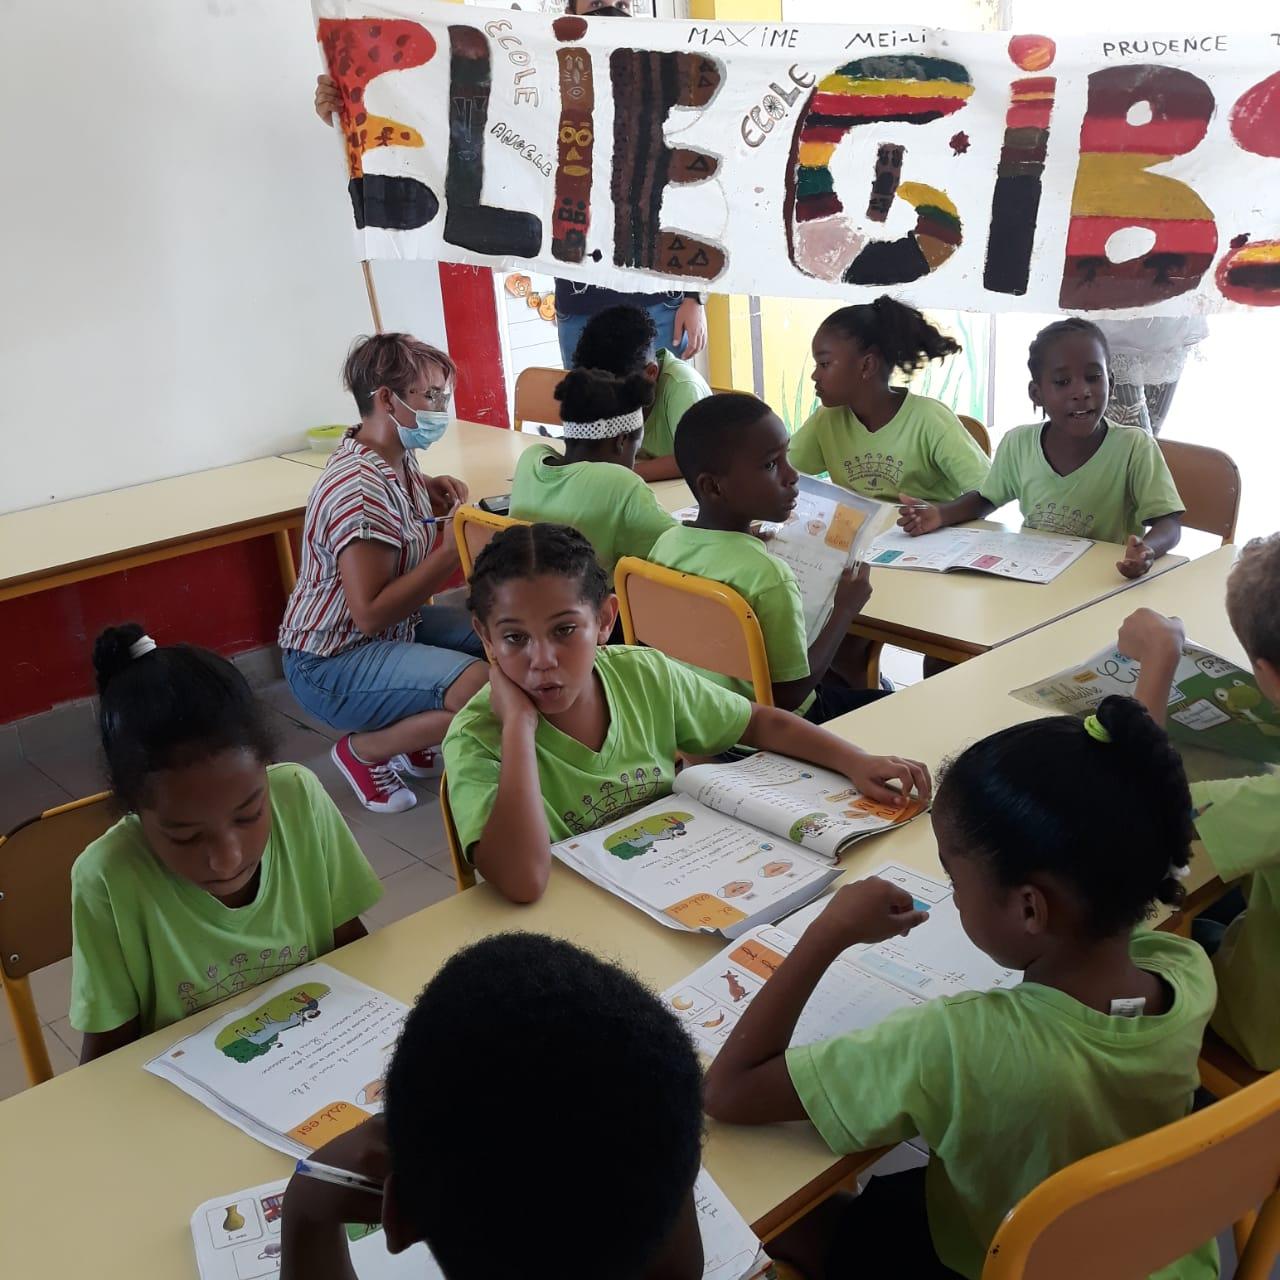 Ecole Elie Gibs